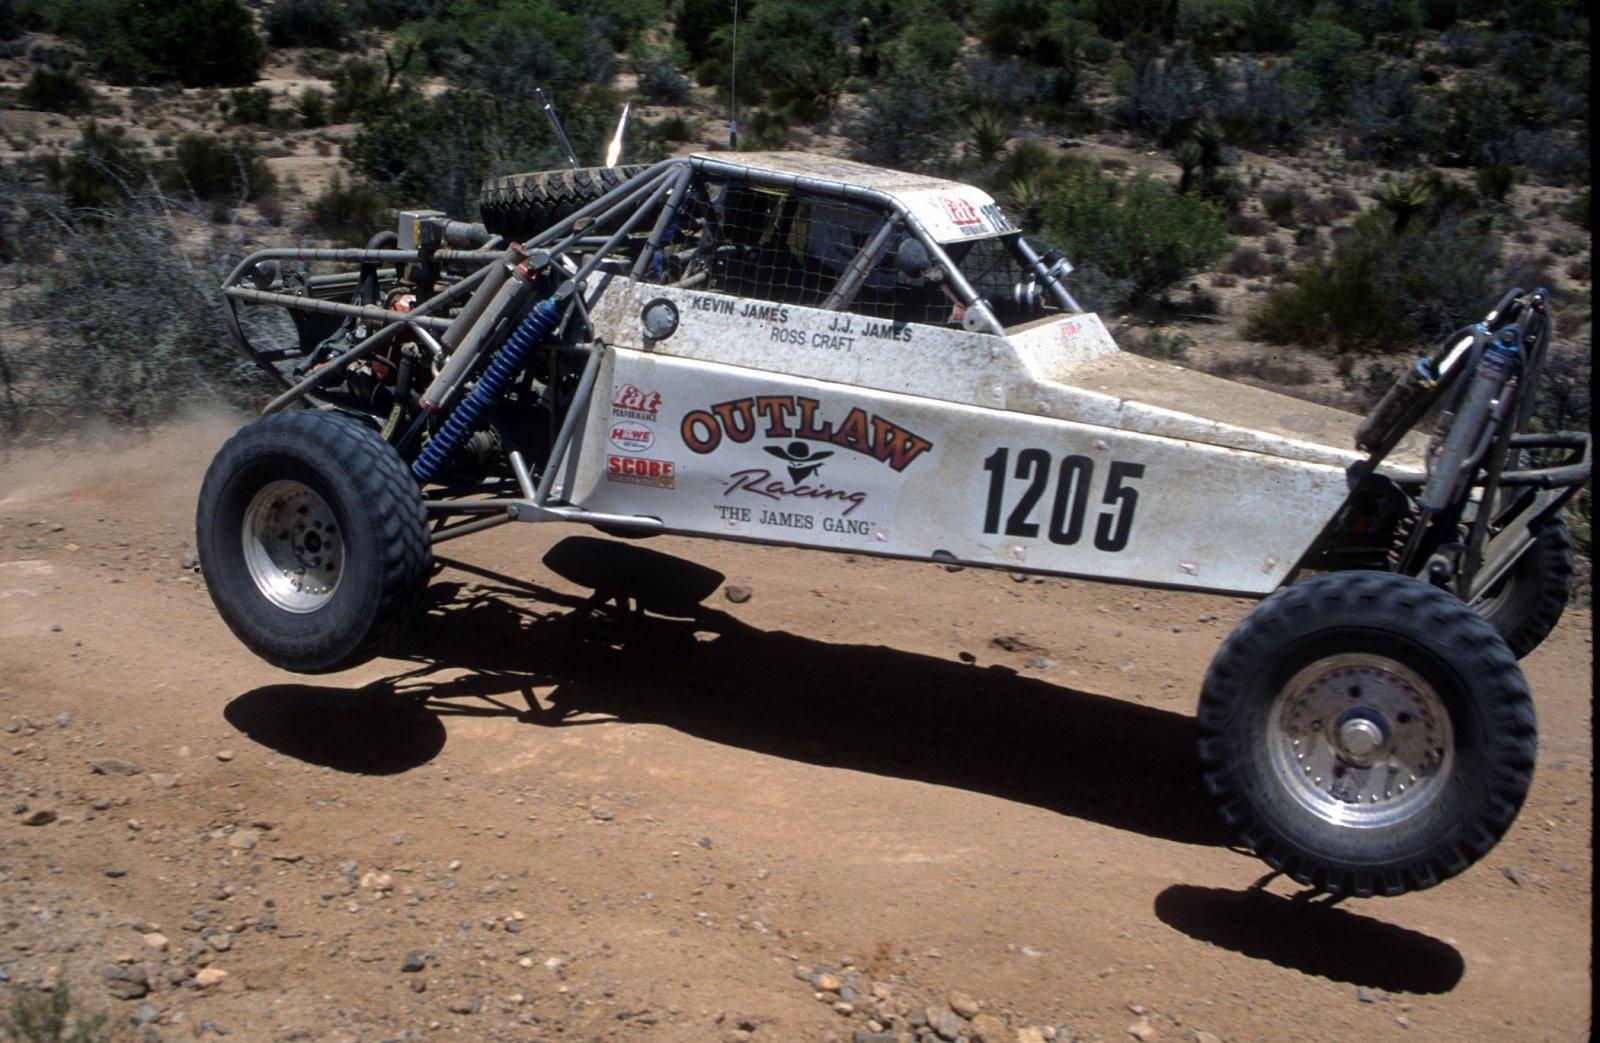 1999.Baja 500.James Gang.1205.21x.jpg